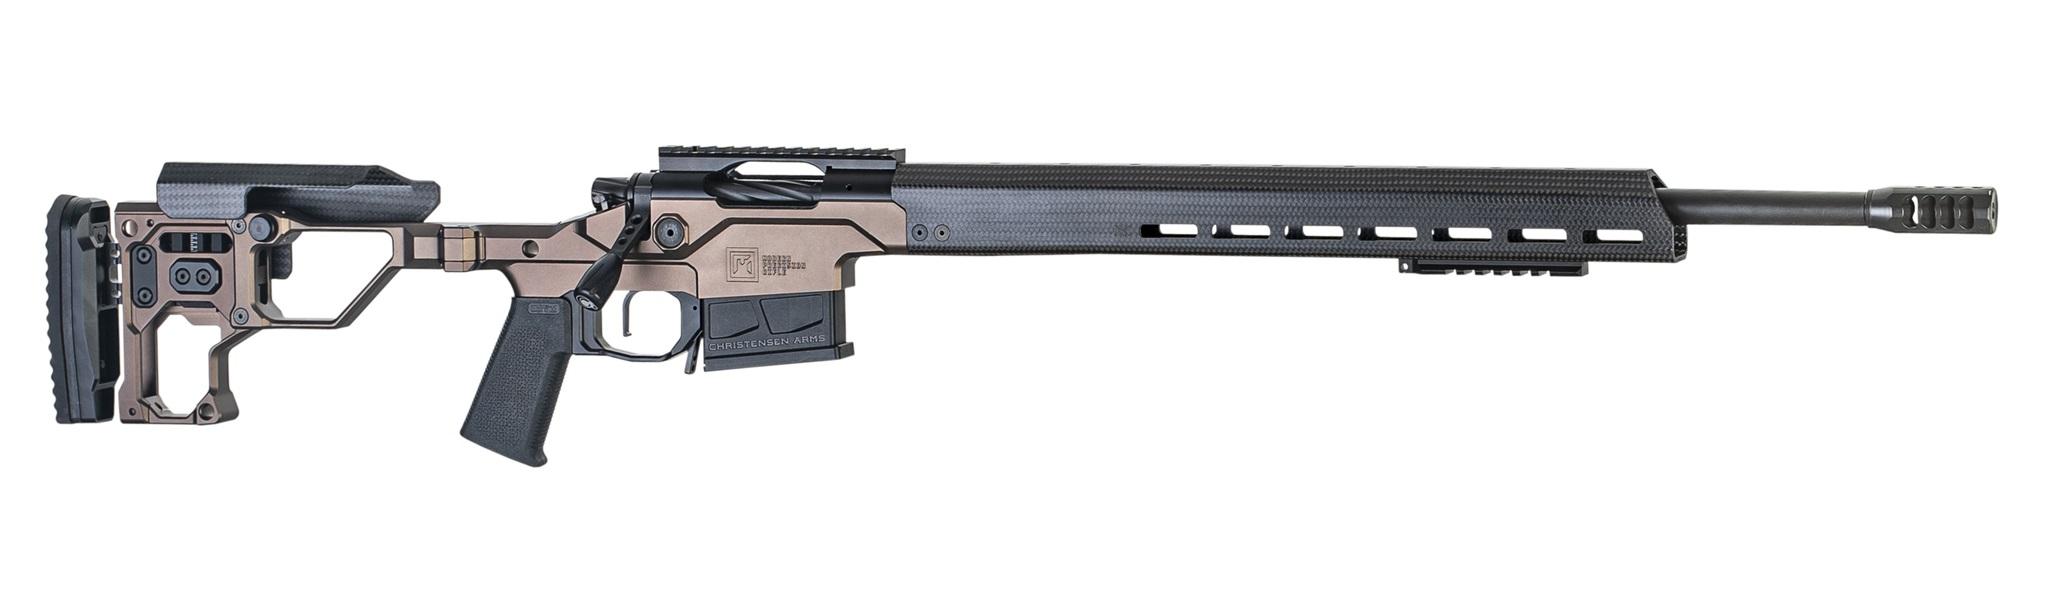 Christensen Arms Modern Precision Rifle 6mm Creedmoor